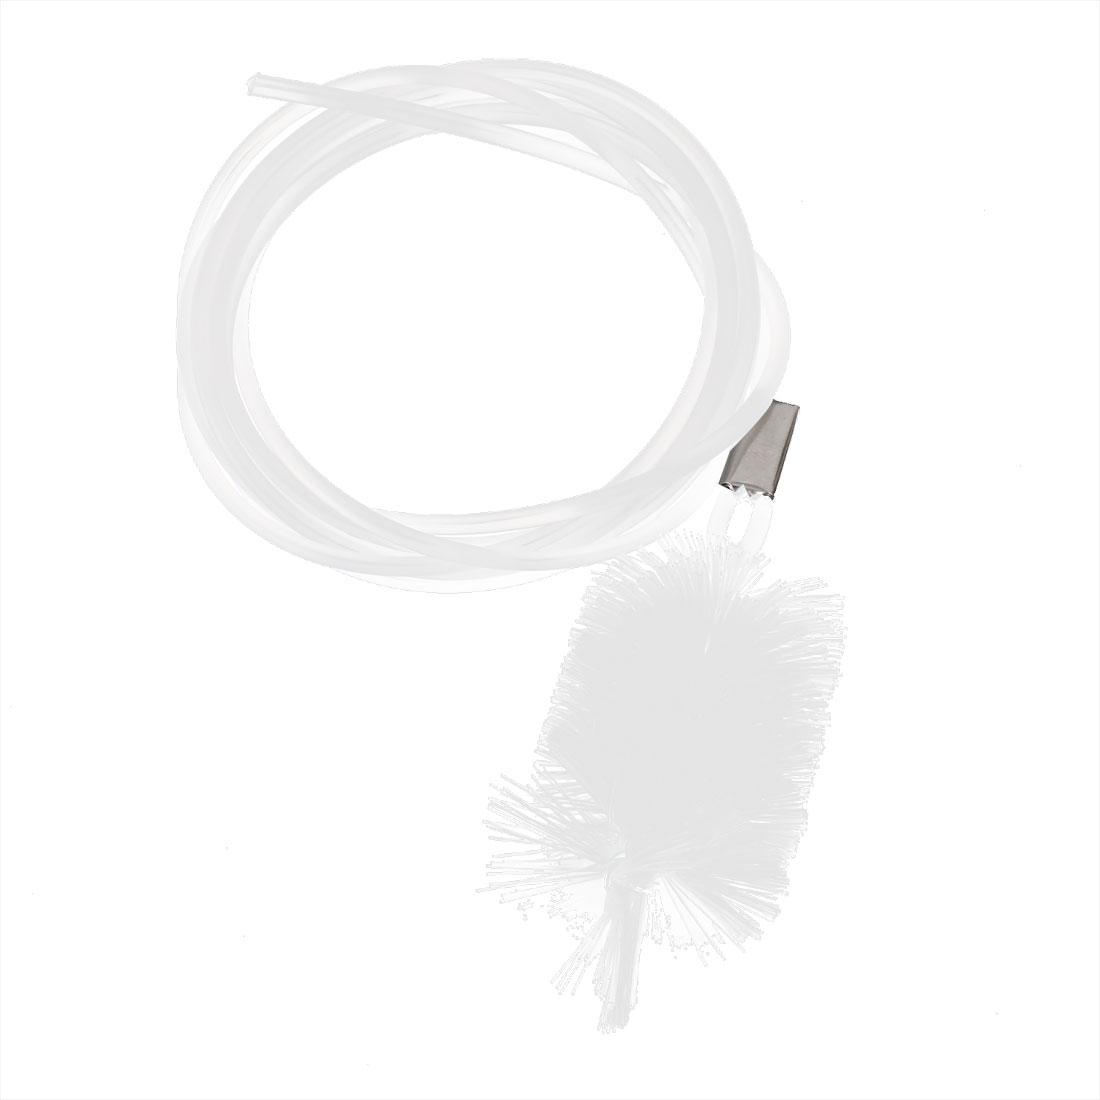 Aquarium White Water Filter Pipe Air Tube Hose Cleaner Brush 150cm Length